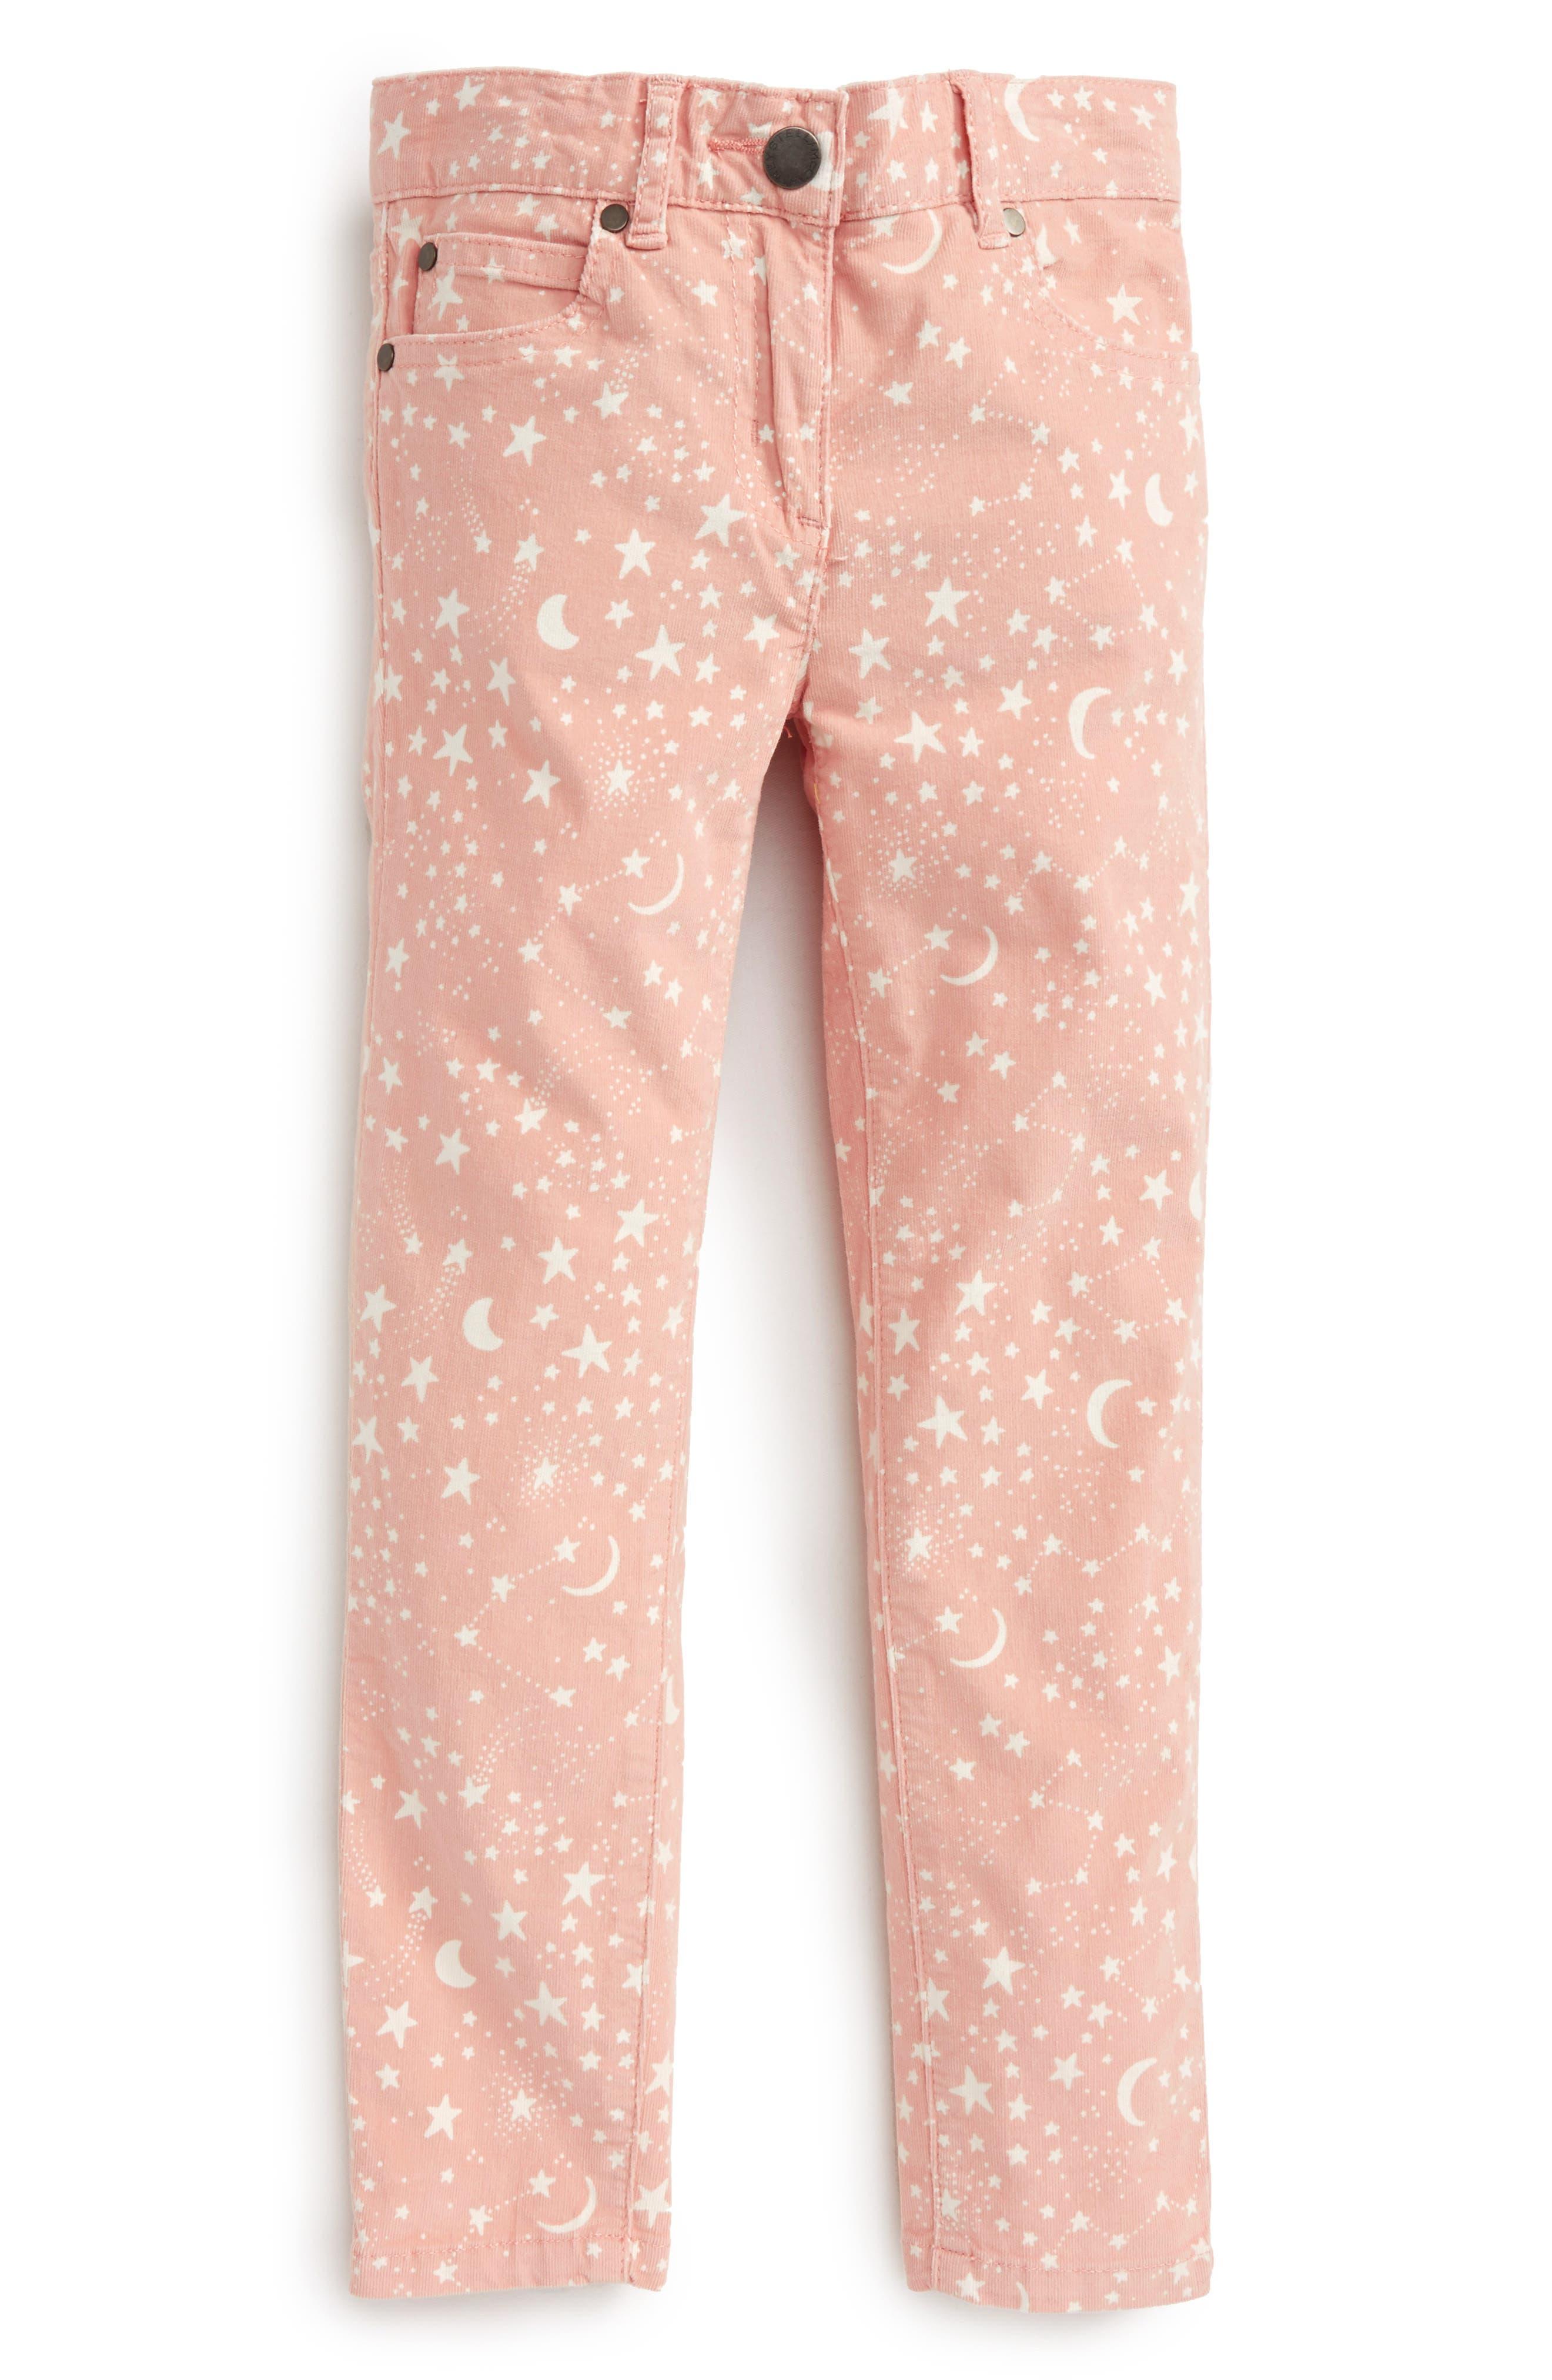 Alternate Image 1 Selected - Stella McCartney Kids Nina Star & Moon Print Skinny Corduroy Pants (Little Girls & Big Girls)